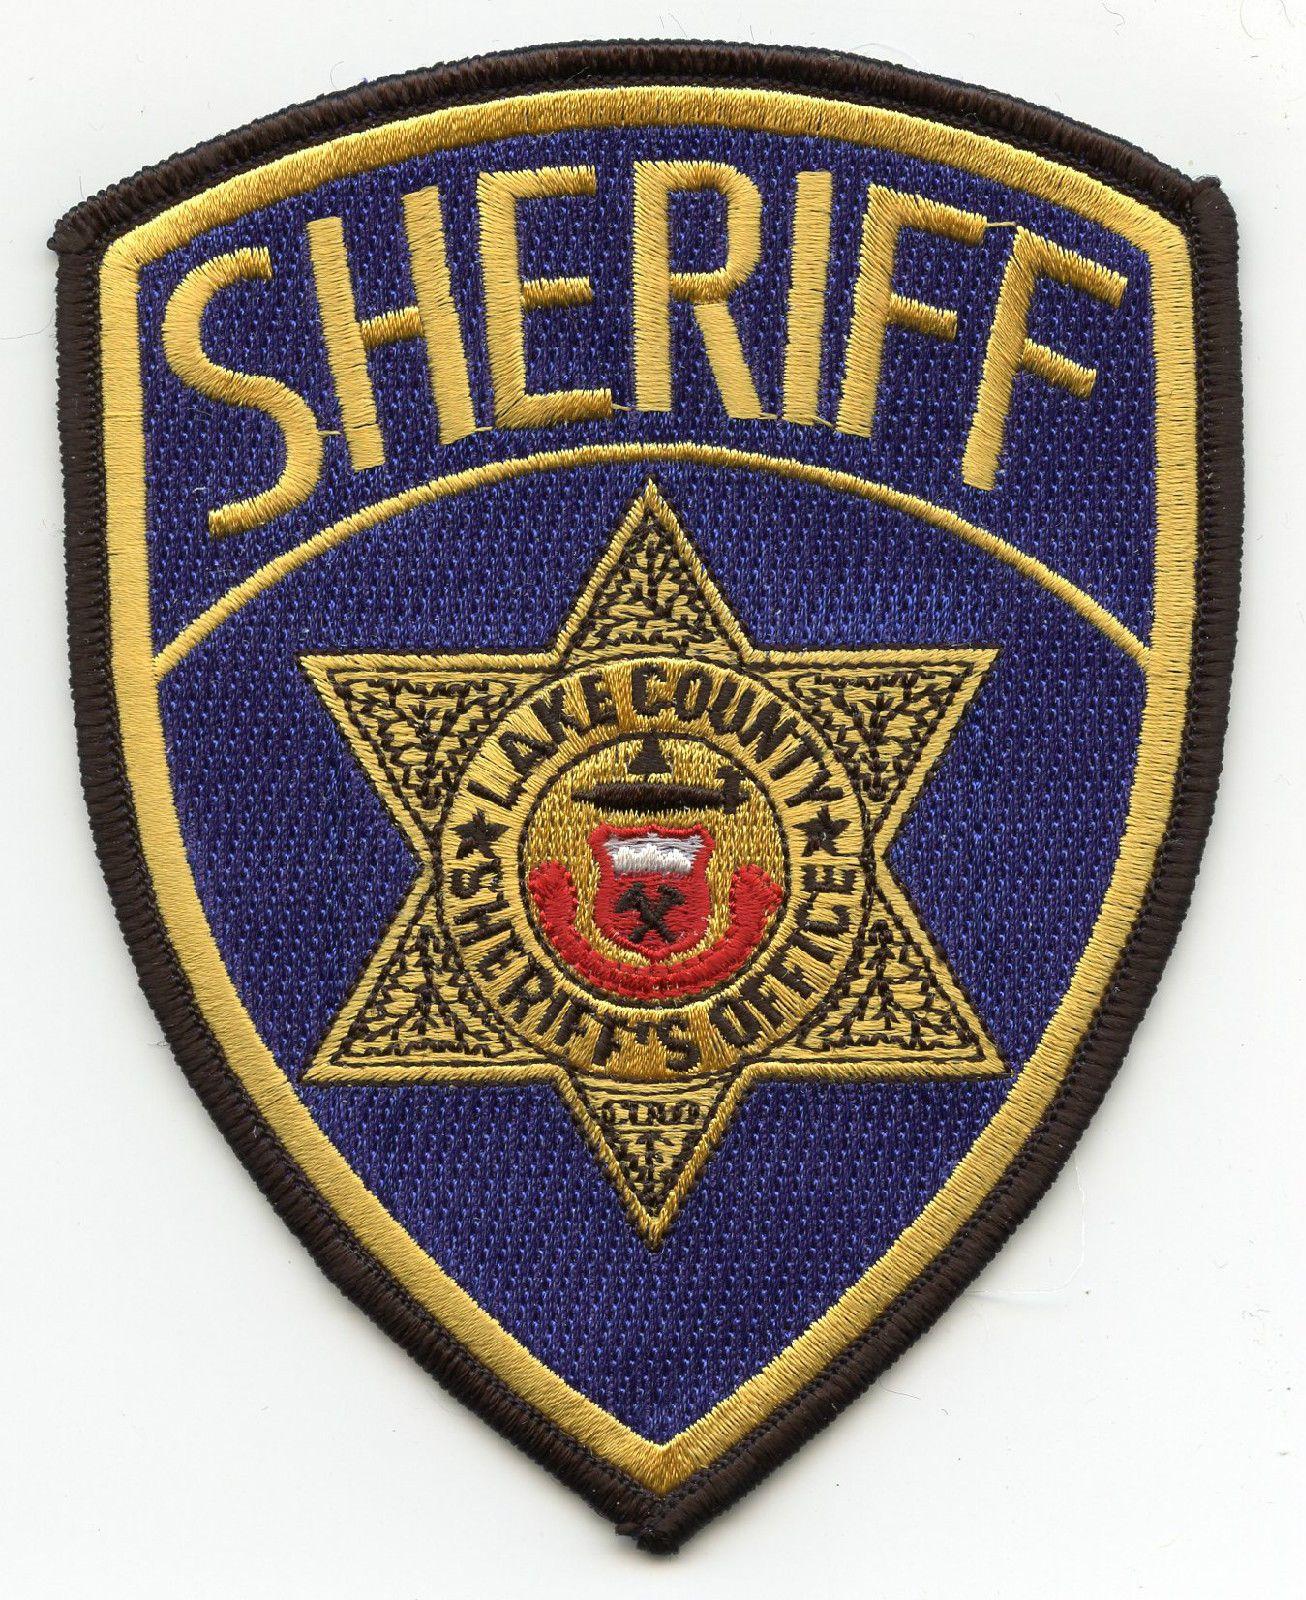 $3 99 - Old Vintage Lake County Colorado Co Sheriff Police